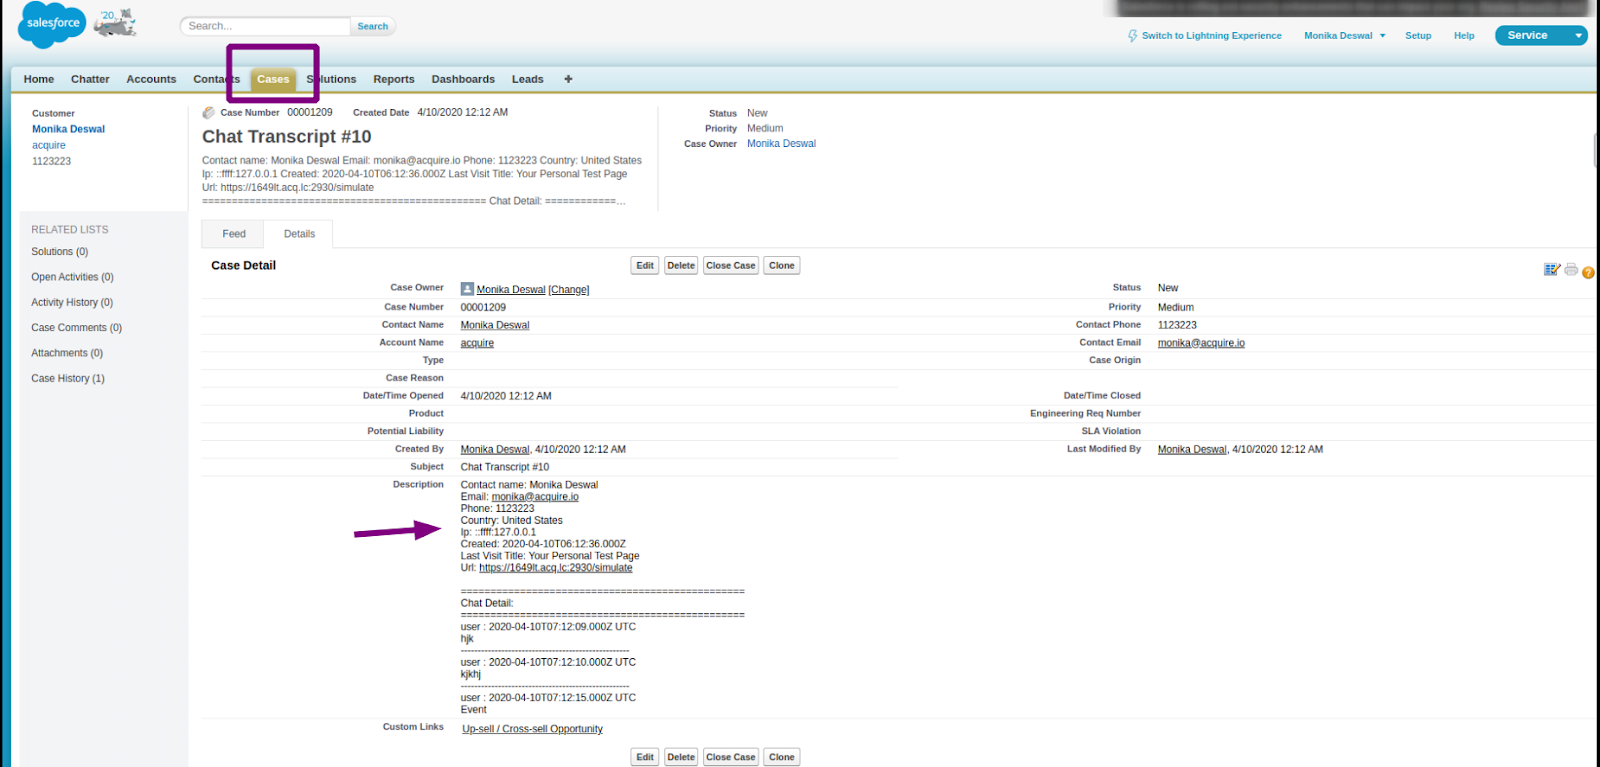 view-chat-transcripts-in-Salesforce-47015de3437e805d4bf98383.png